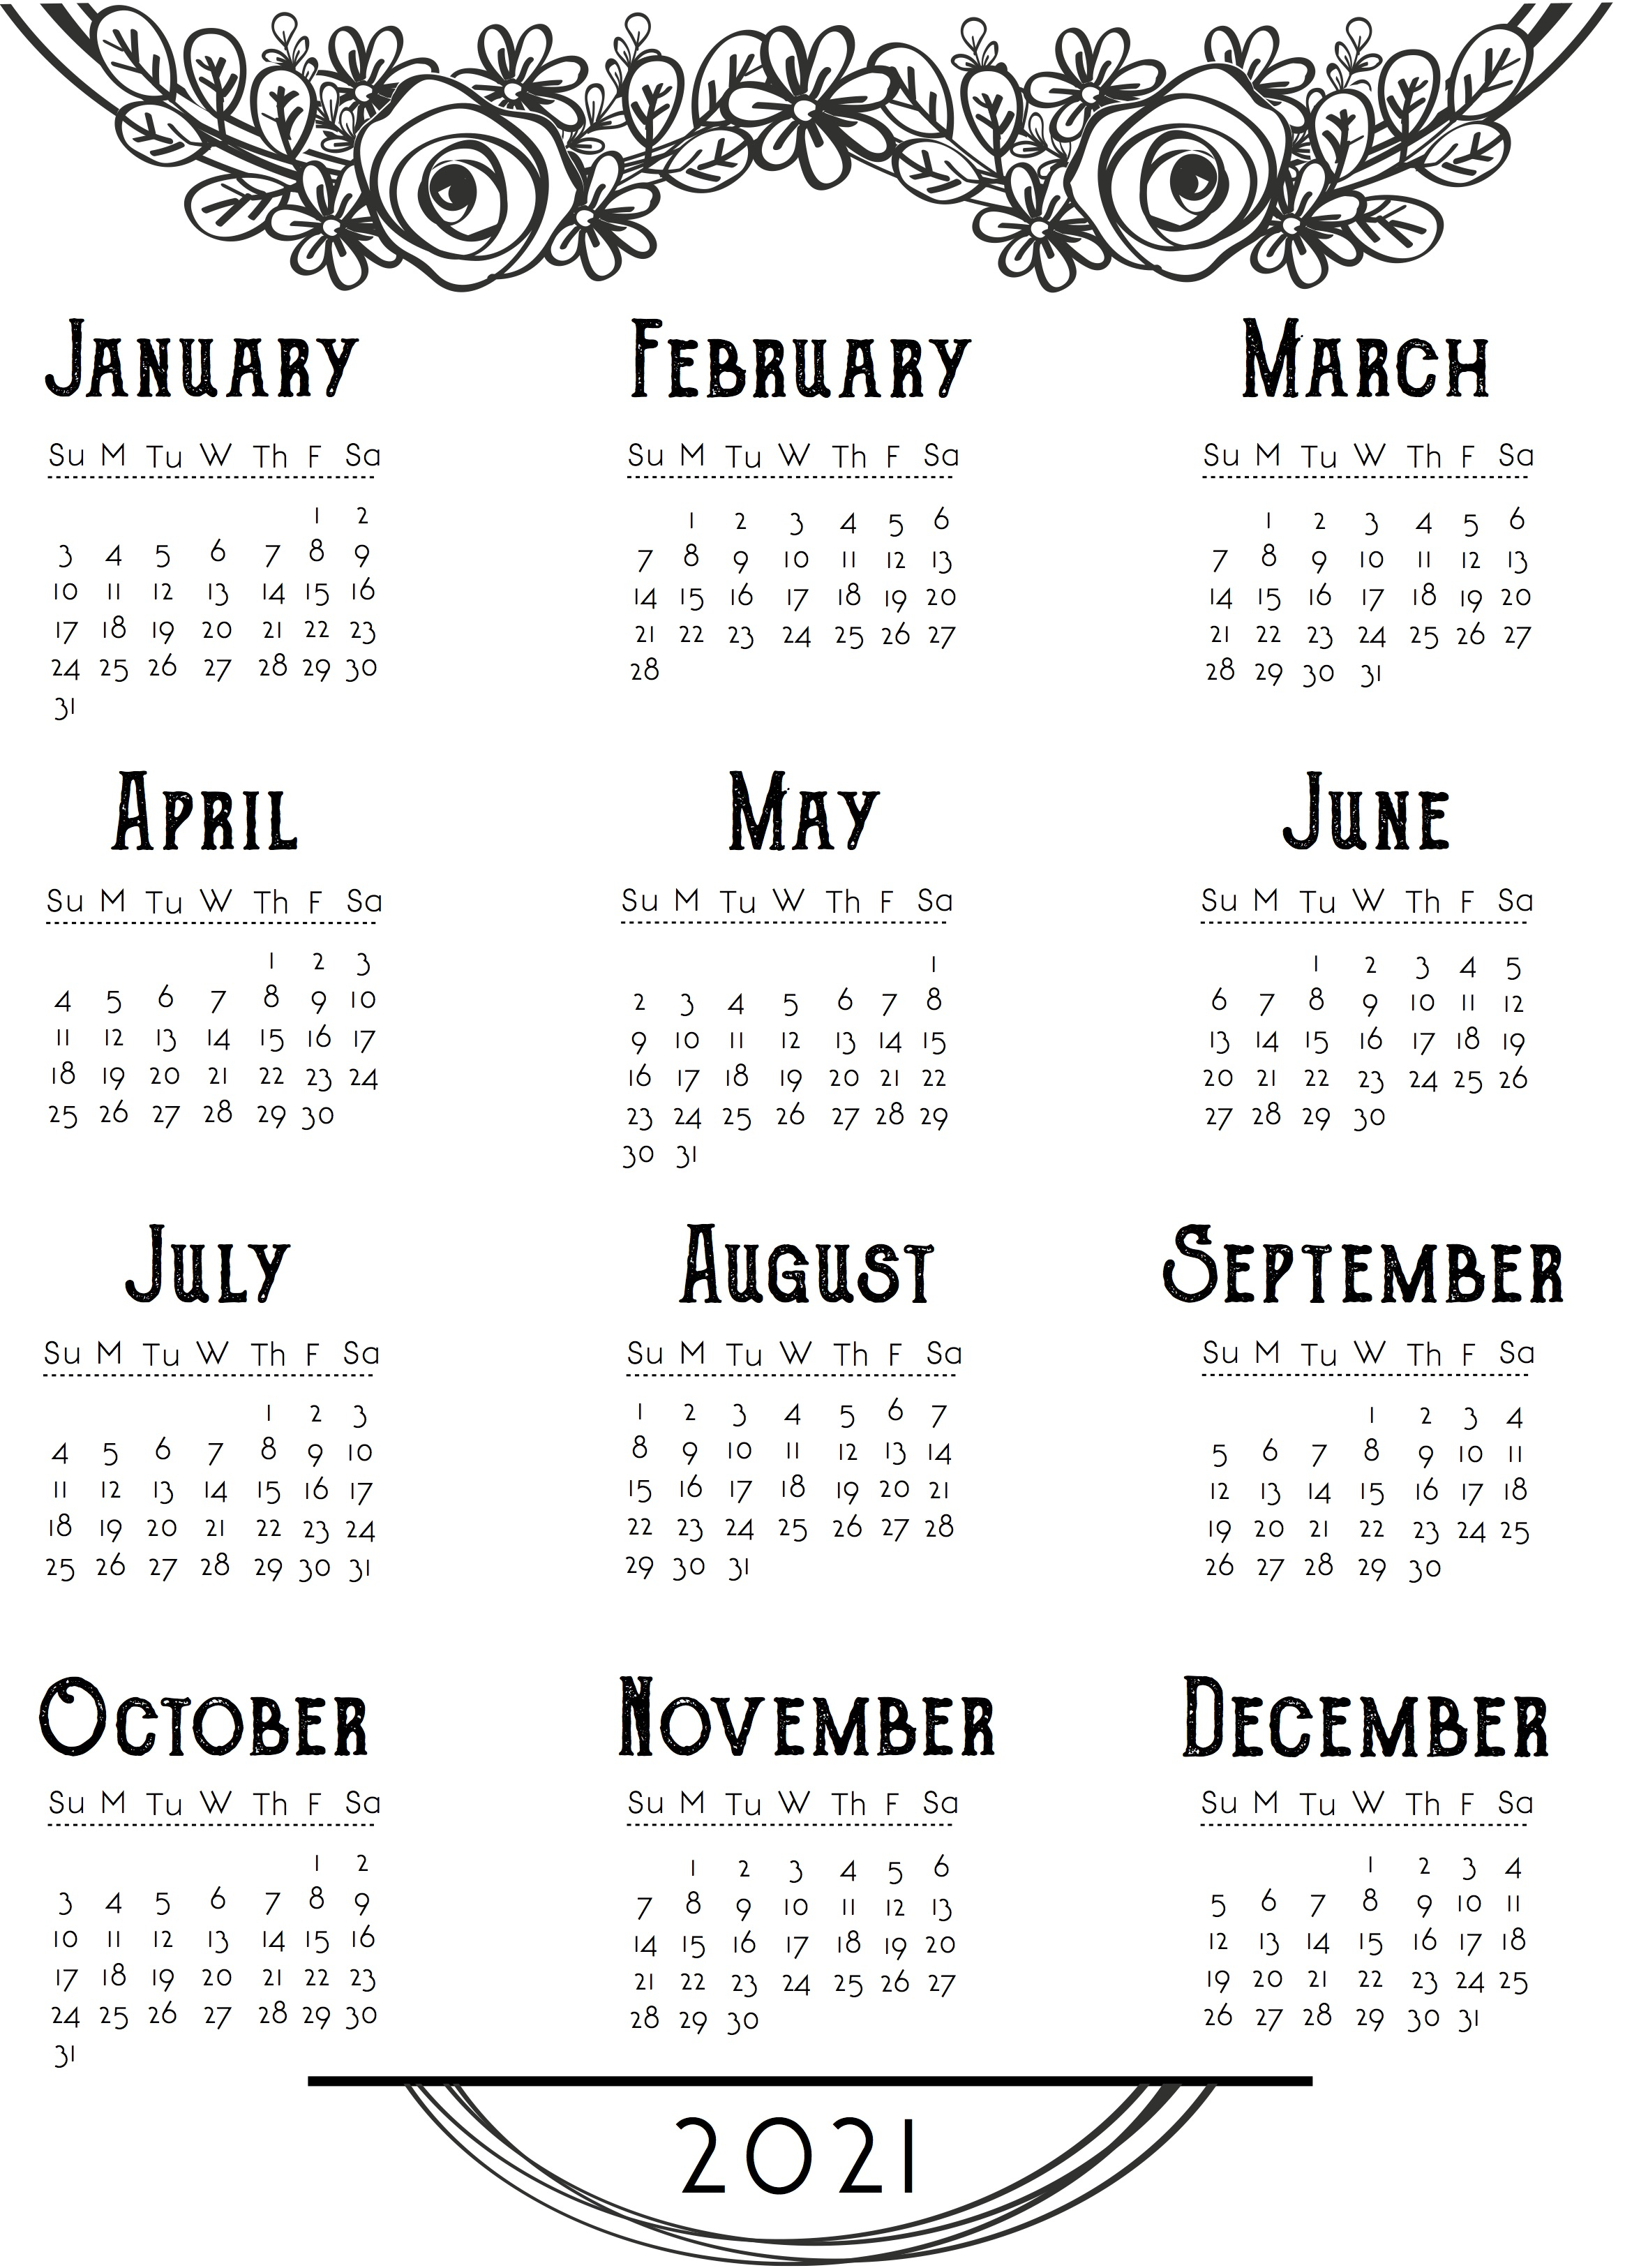 Https://scrappystickyinkymess.wordpress/2020/05/03/new Pertaining To Editable 2021 Elf Calendar